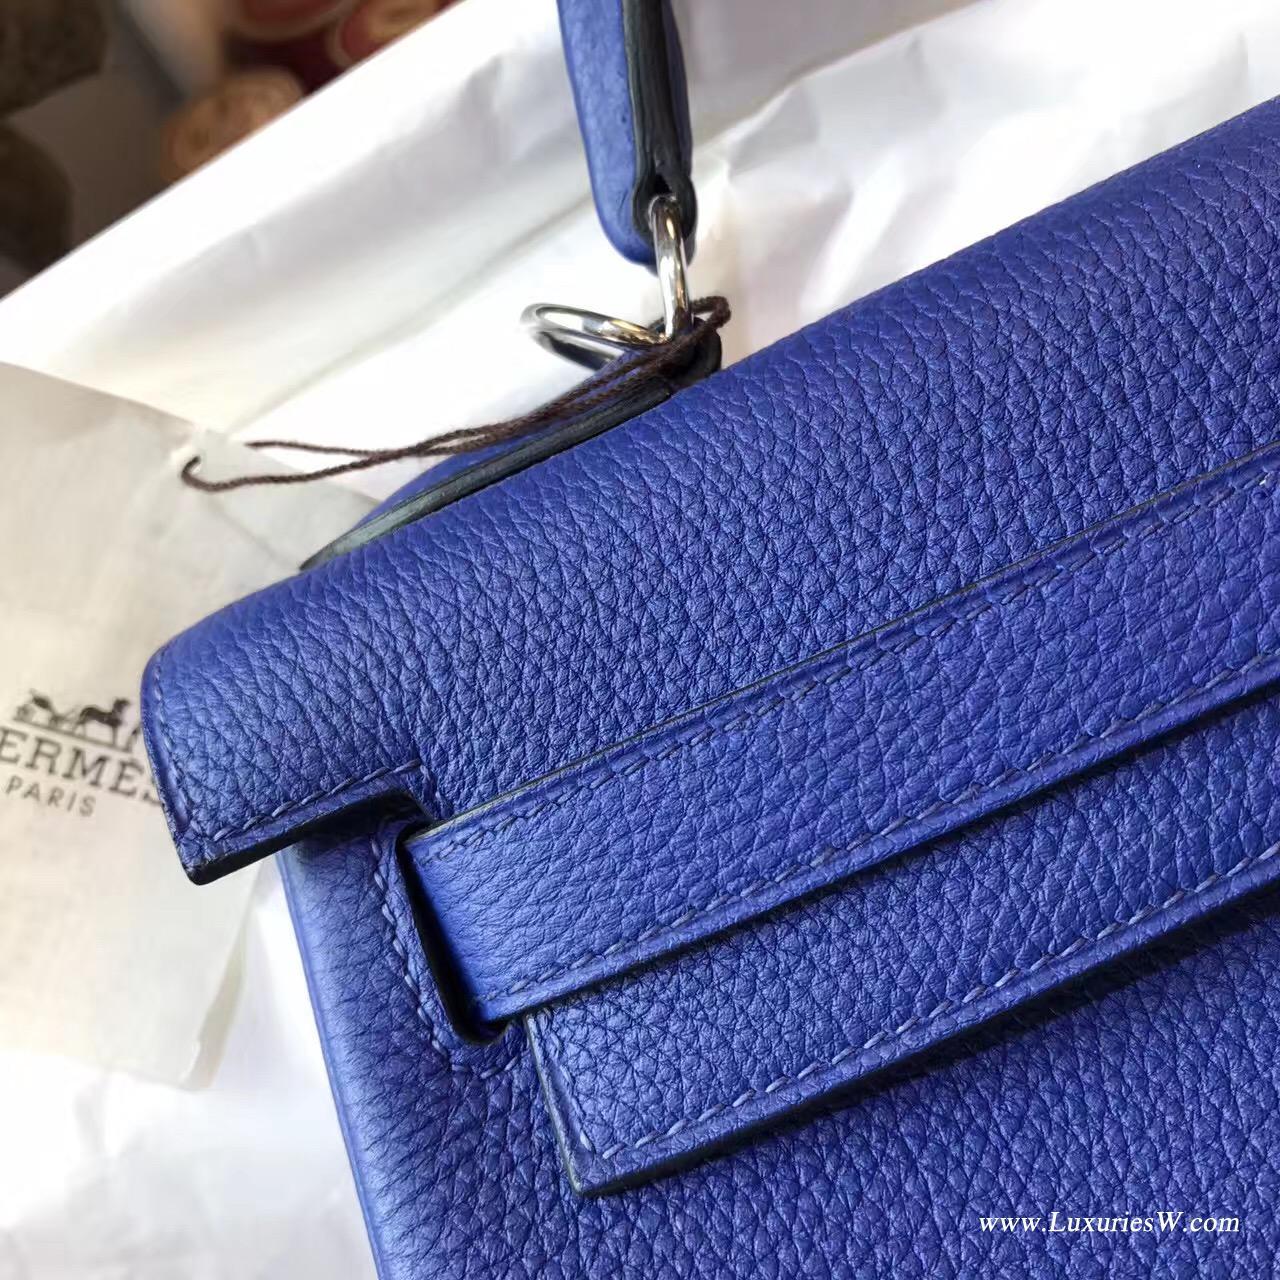 愛馬仕凱莉包Hermes Kelly 32cm Togo 7T Blue Electric電光藍银扣